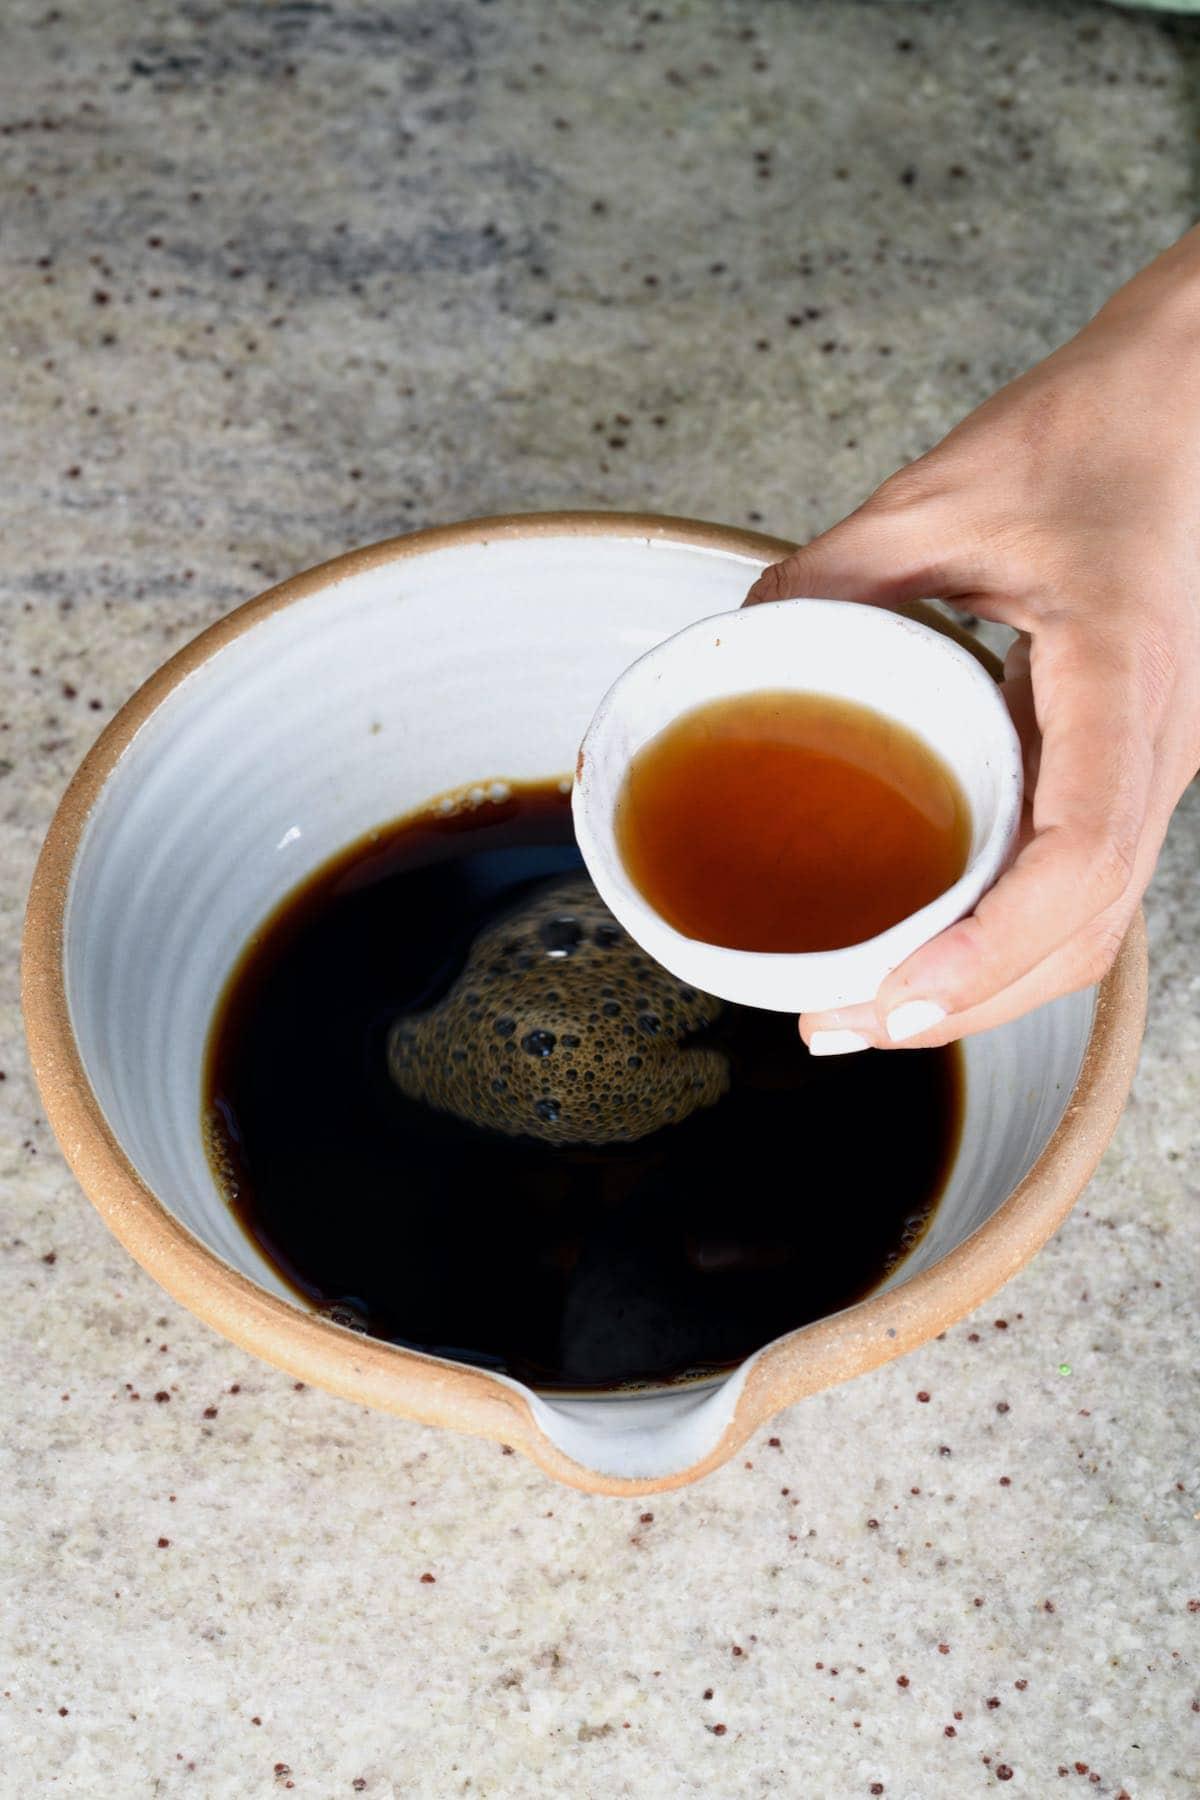 Mixing espresso with marsela